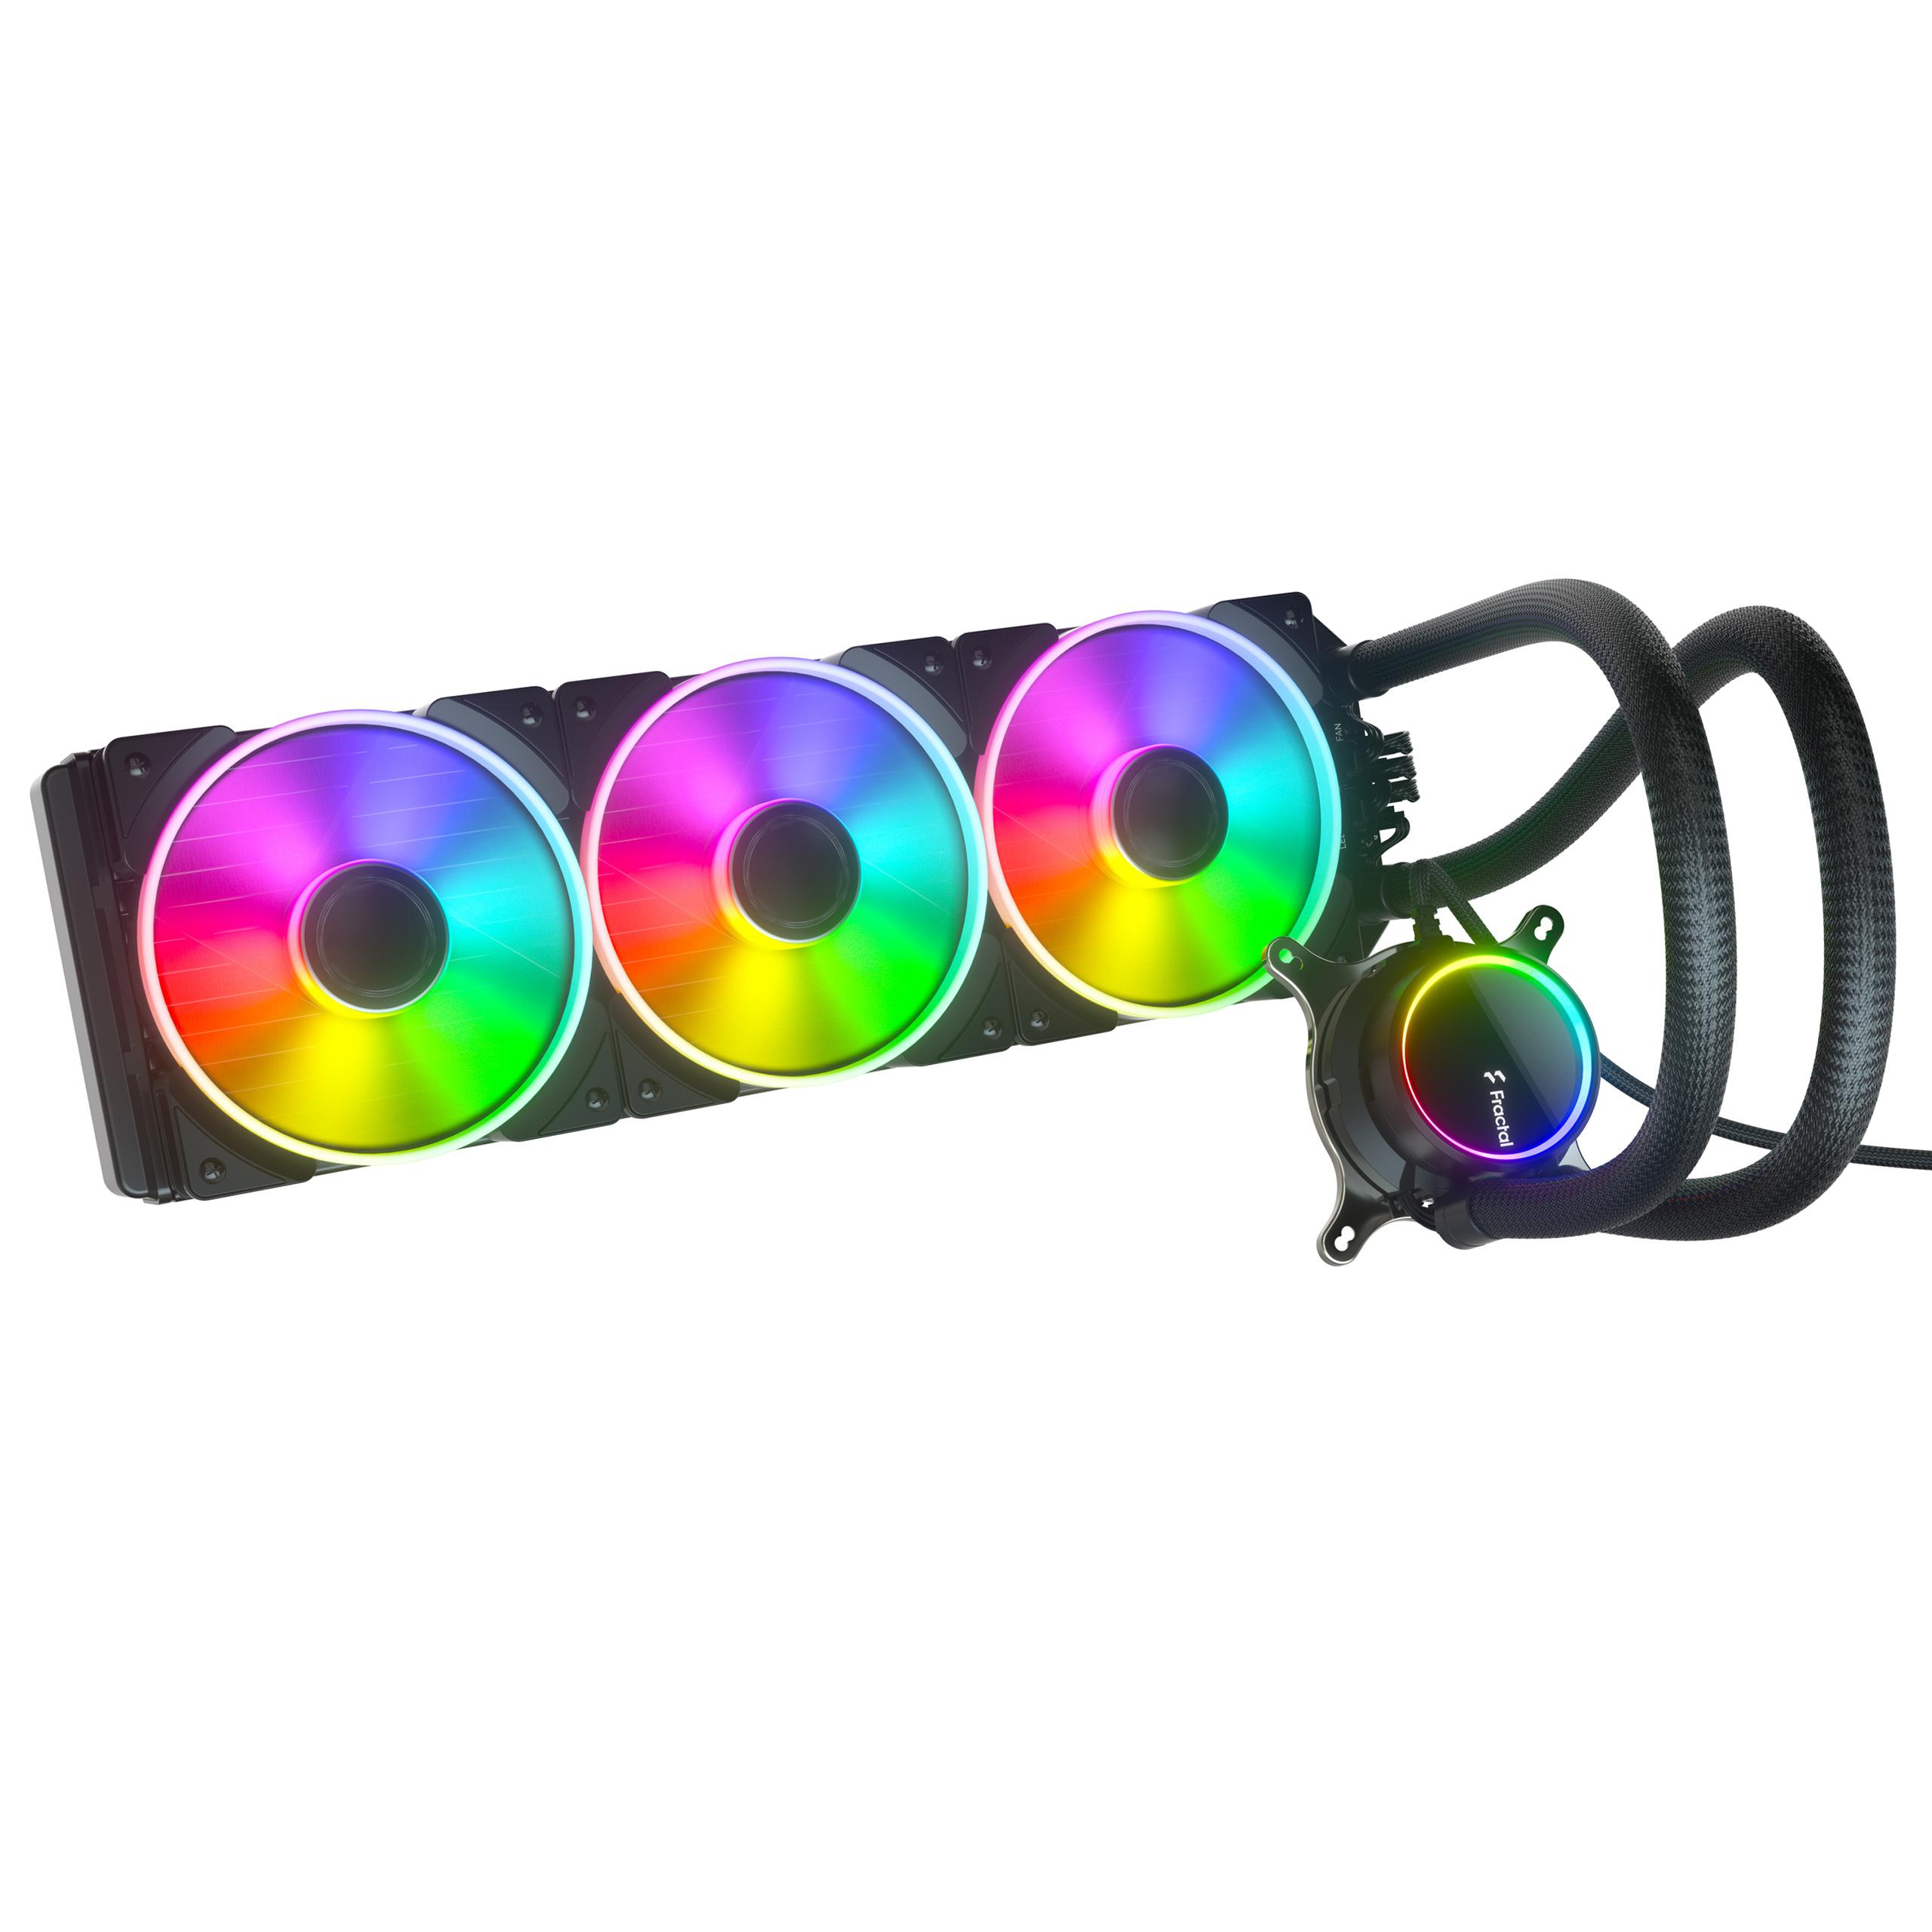 Celsius+ S36 Prisma - RGB - 360 mm